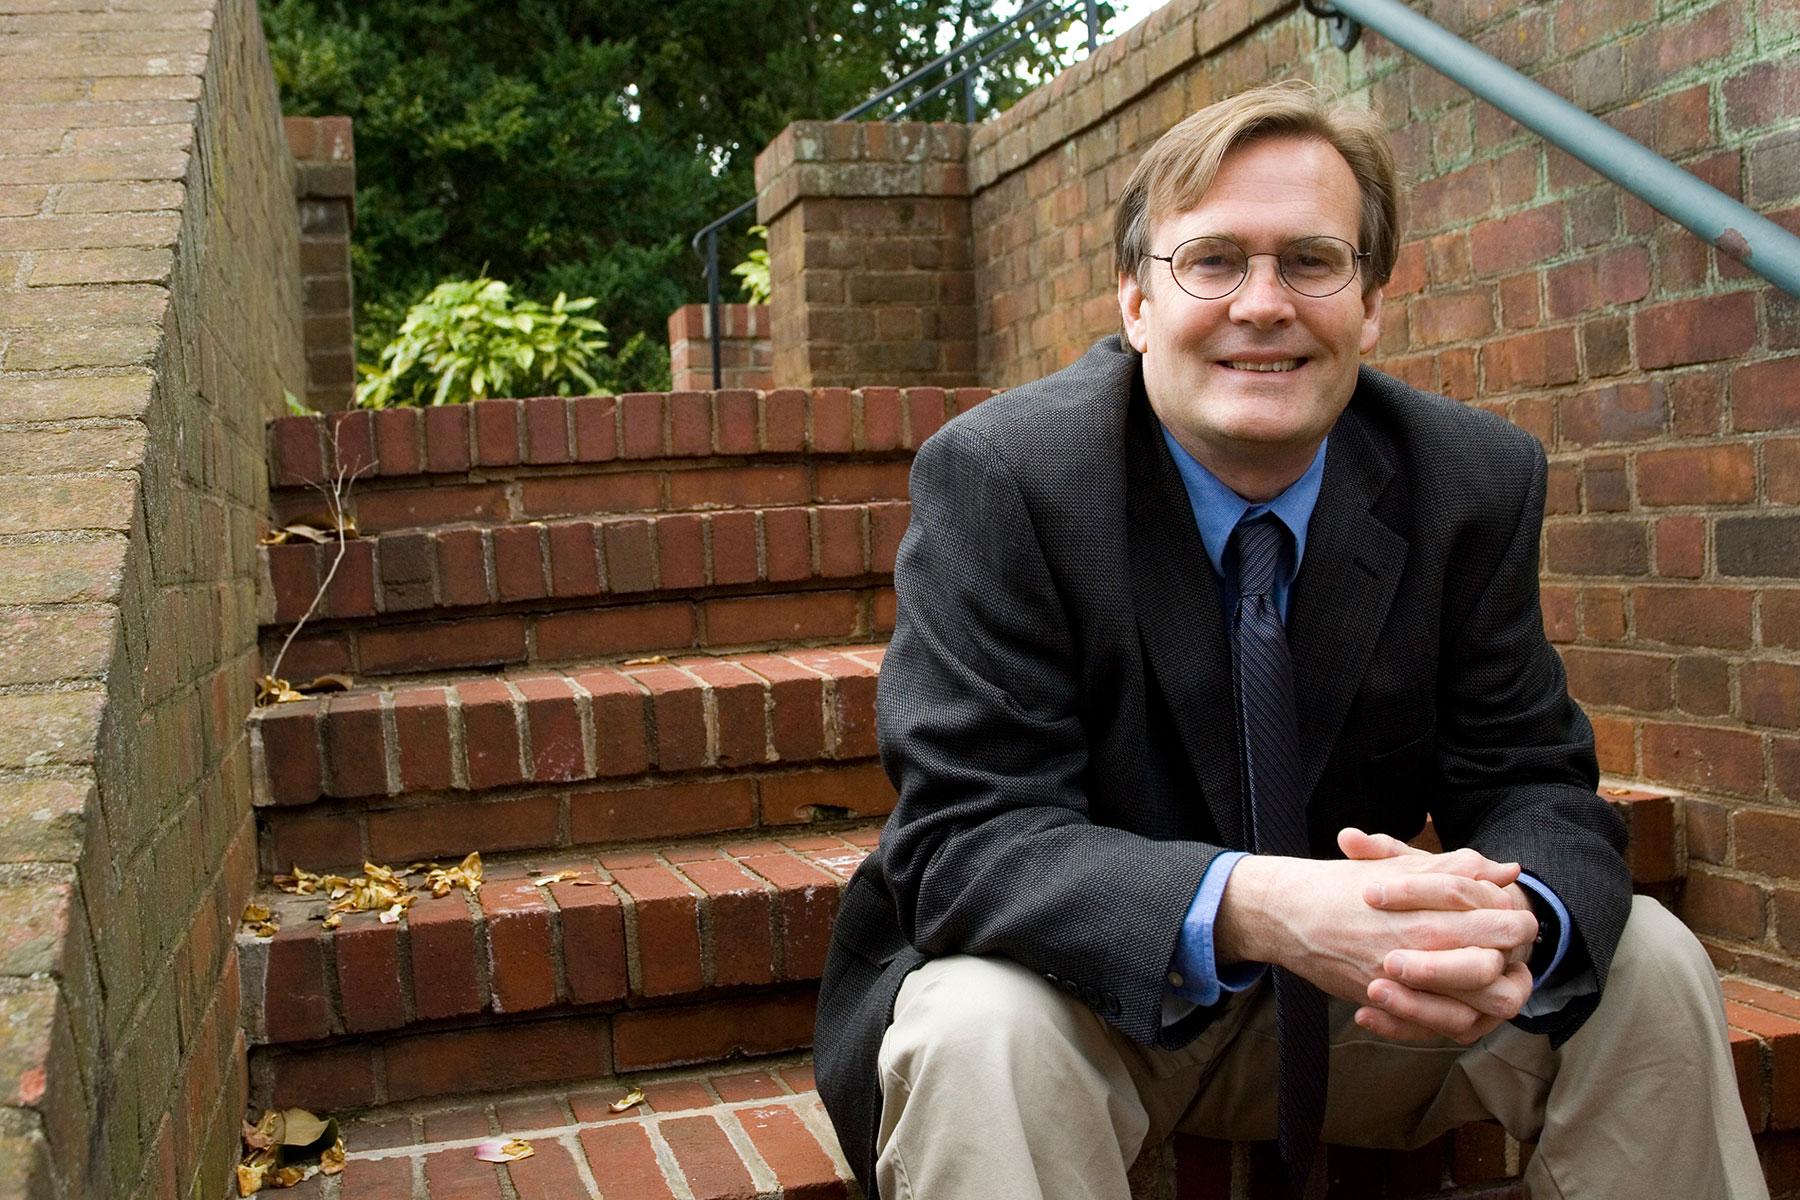 Tim Beatley, the Teresa Heinz Professor of Sustainable Communities, founded the Biophilic Cities Network in 2013.